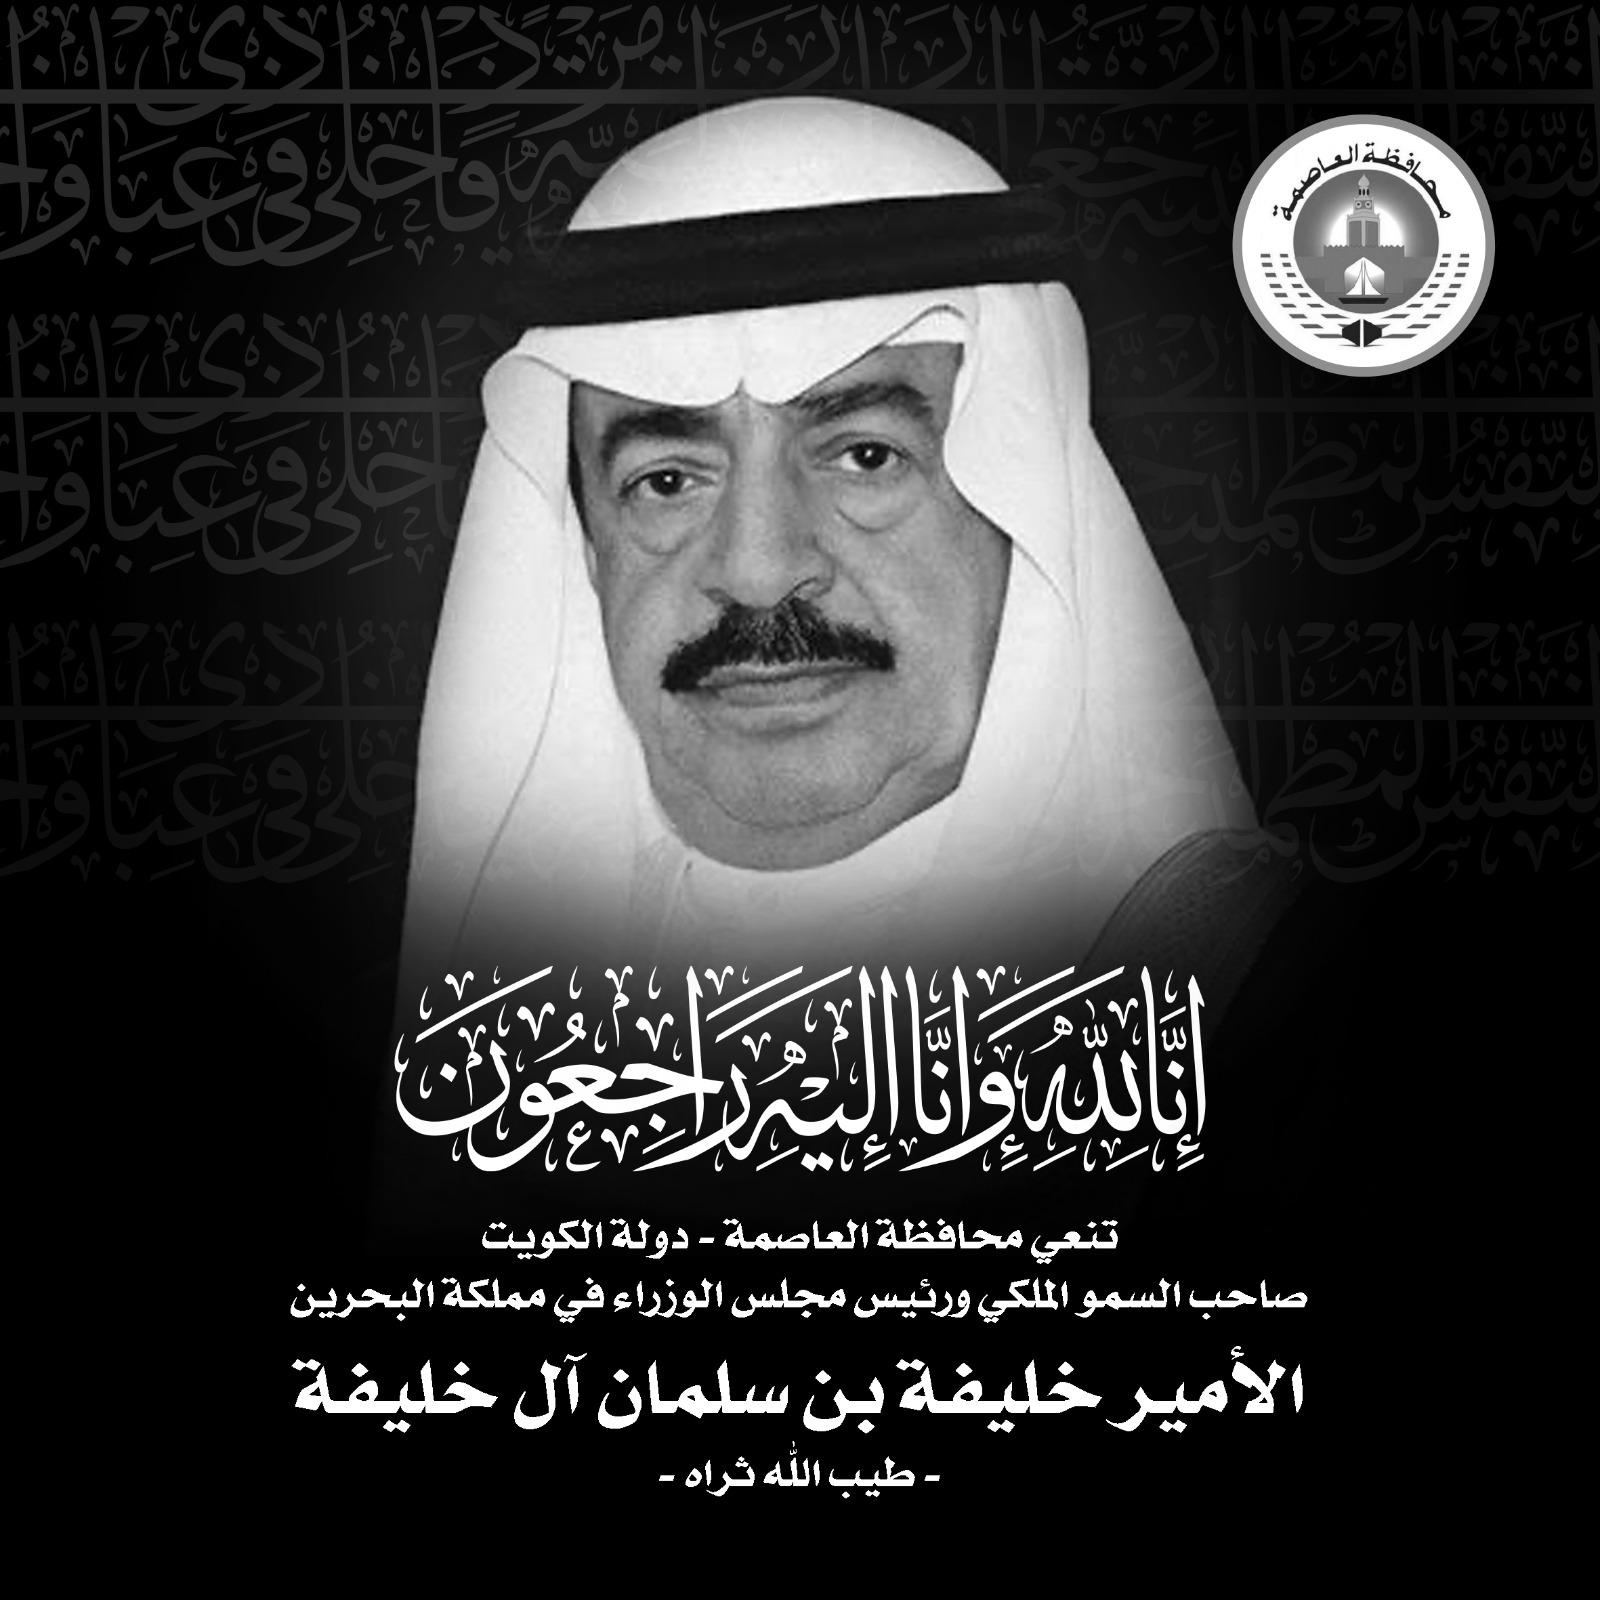 b71fa010 5eea 4d6c 9ff4 1b695957d845 - معالي محافظ العاصمة يعزي مملكة البحرين في وفاة سمو رئيس مجلس الوزراء